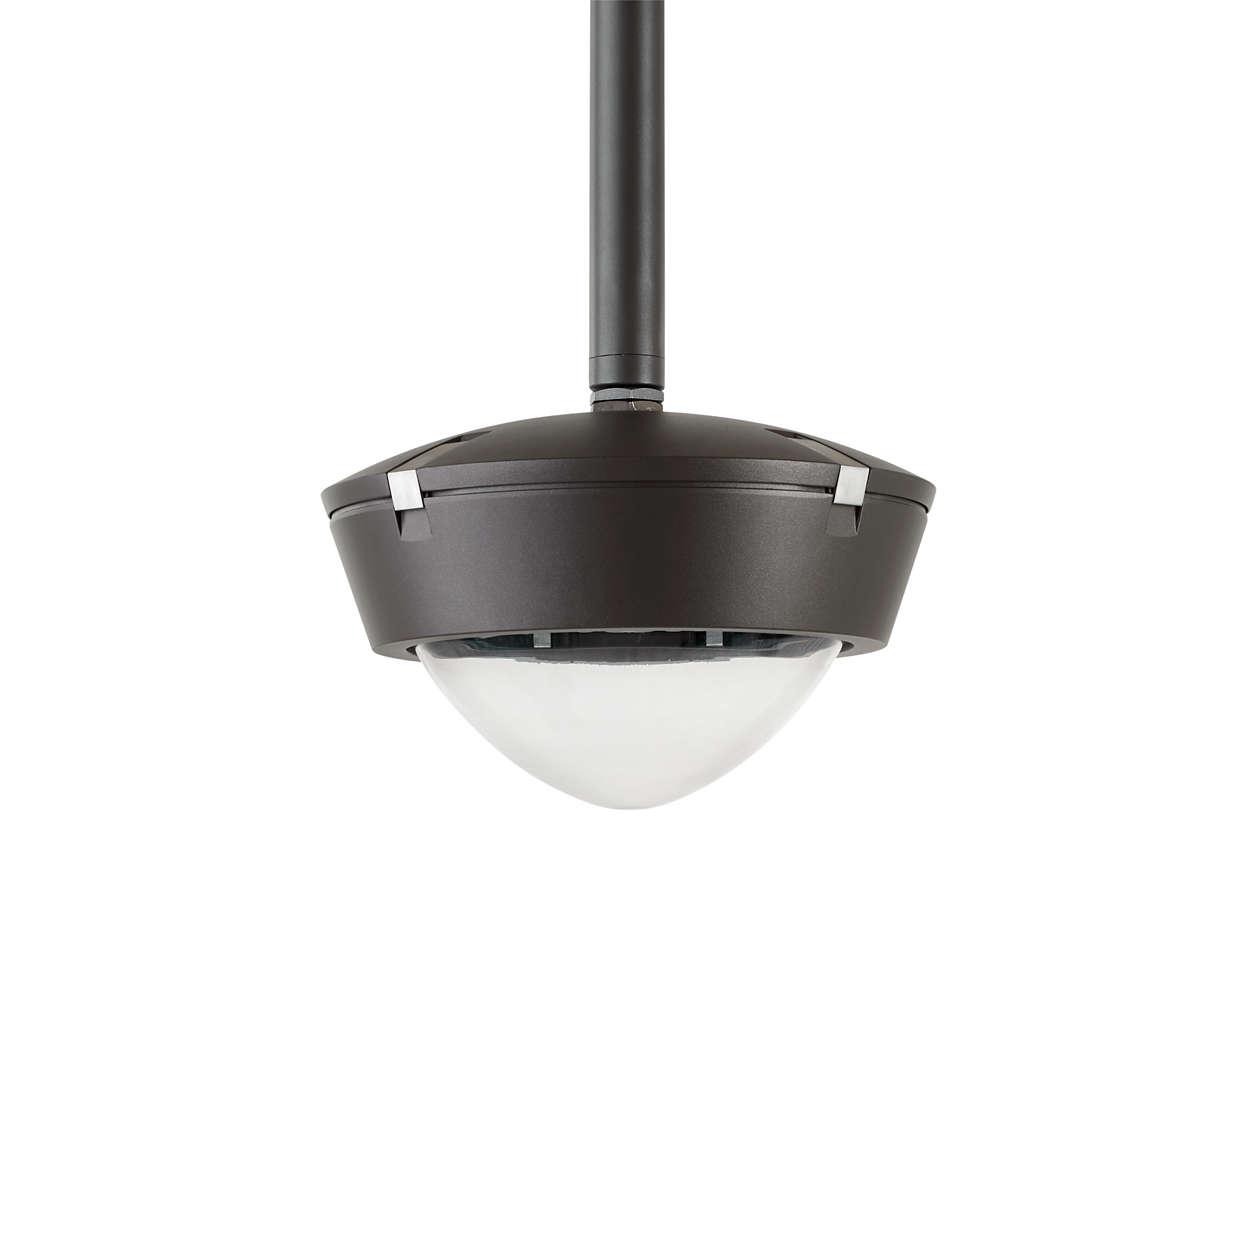 Thema 2 LED: corp de iluminat rotund eficient şi elegant